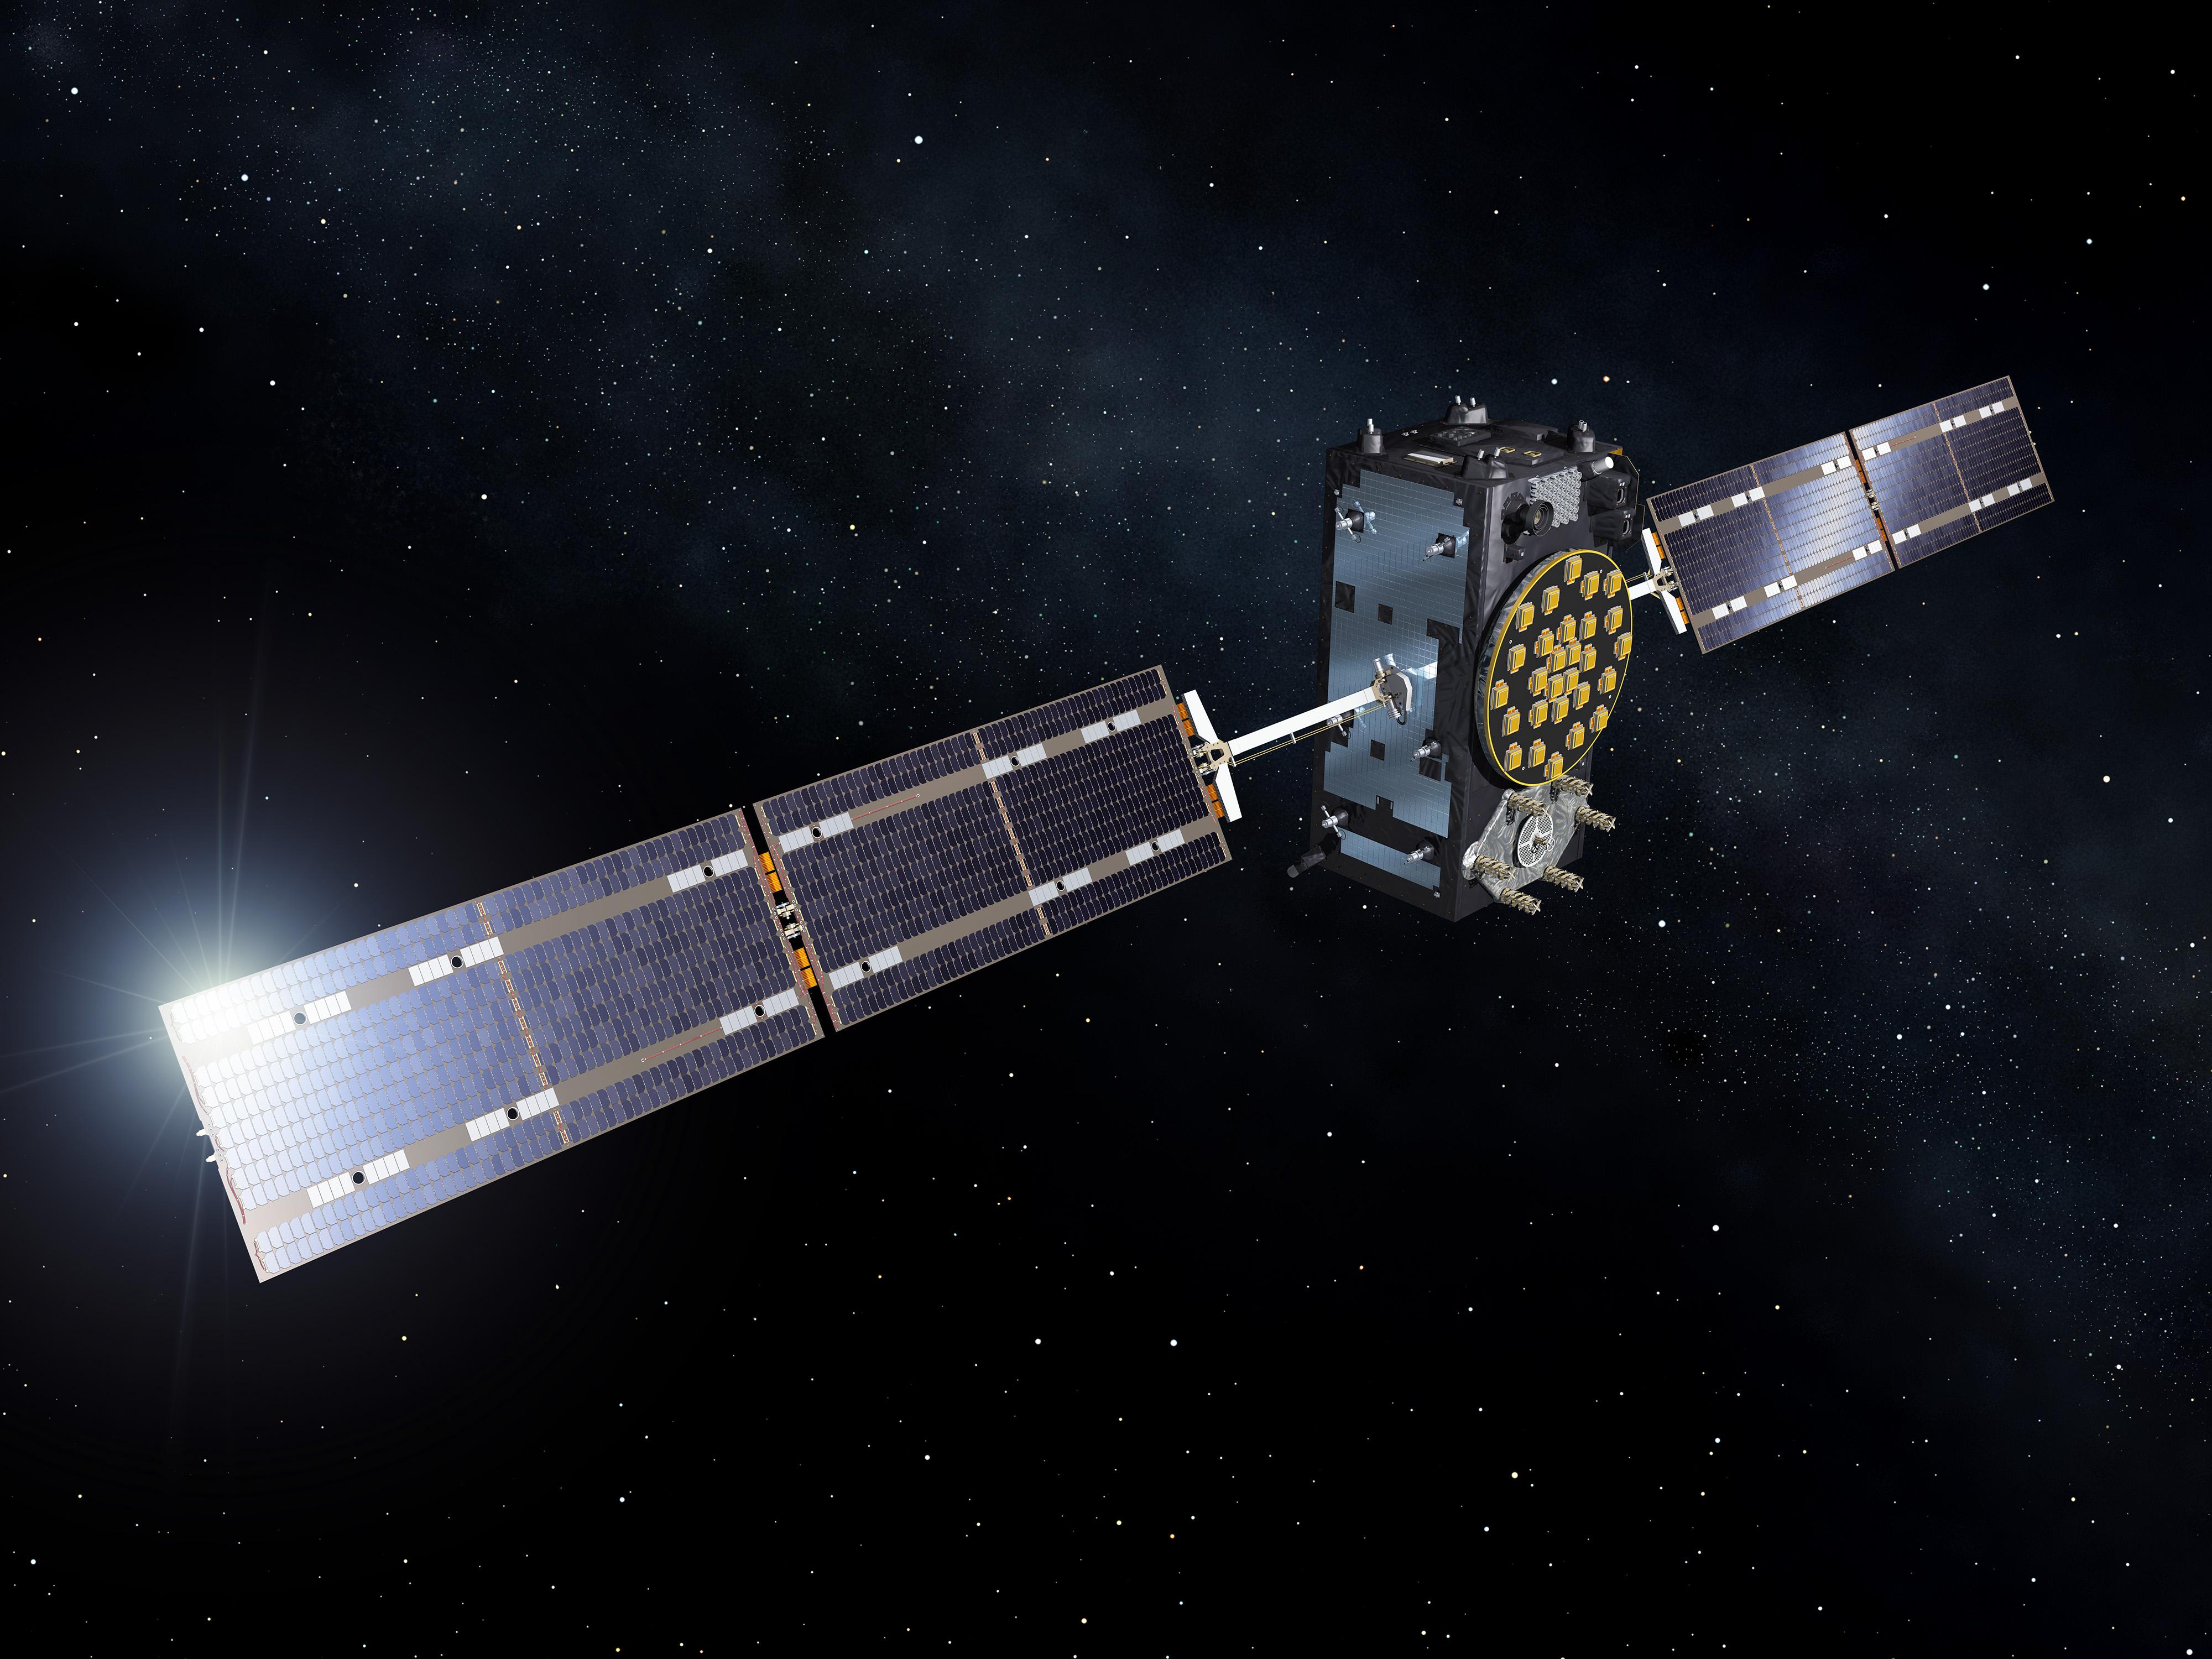 Galileo. Credit: ESA